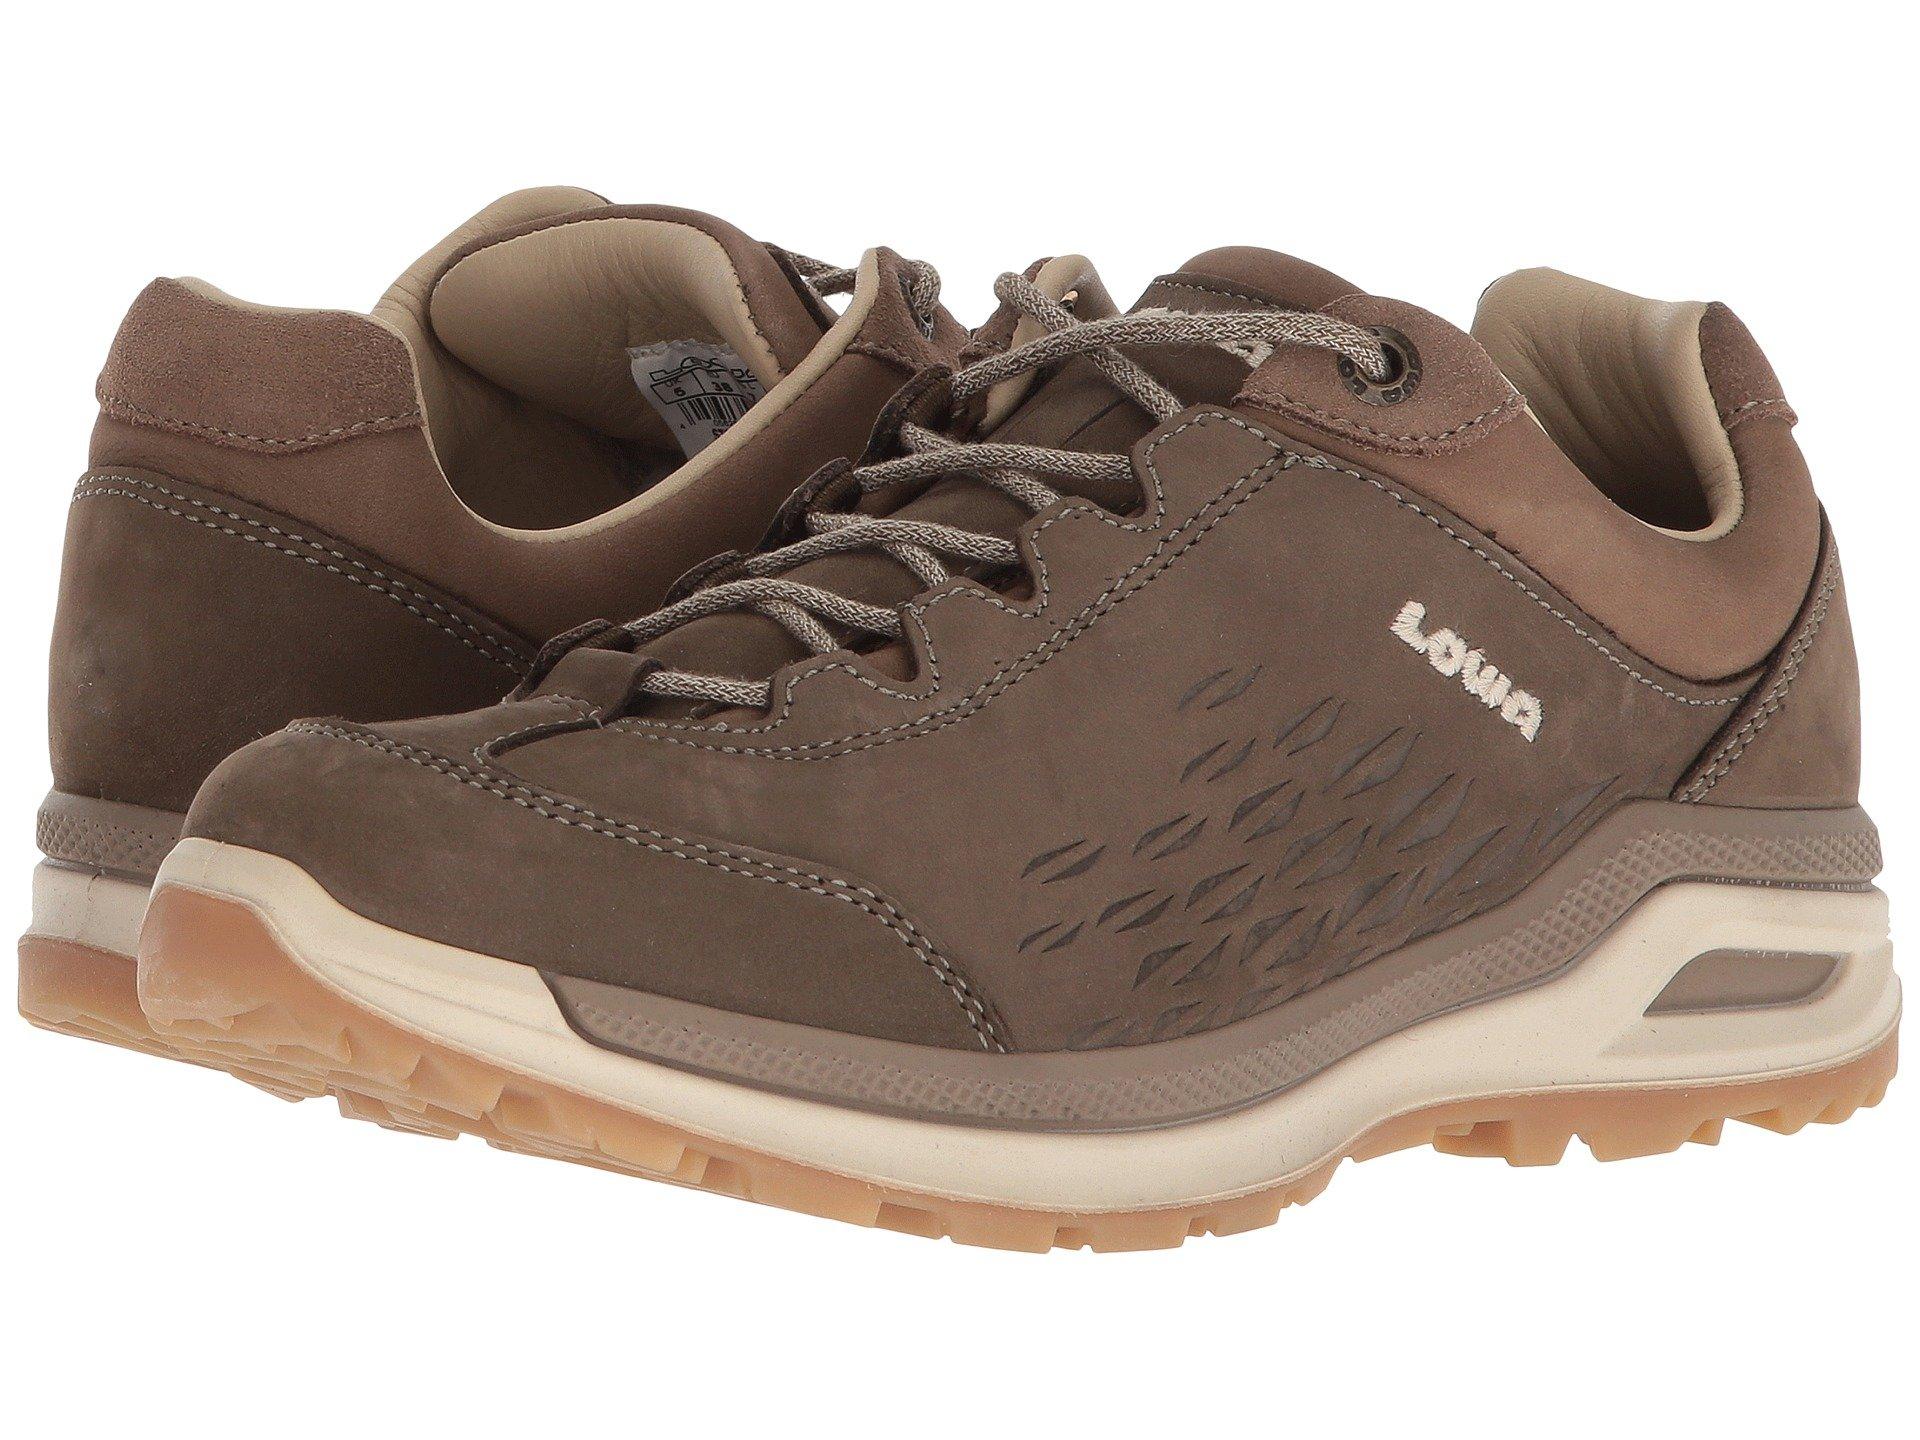 b187c138494 Athletic Shoes Ll amp; Lowa Evo Stone Sneakers Stro Lo Z808agq